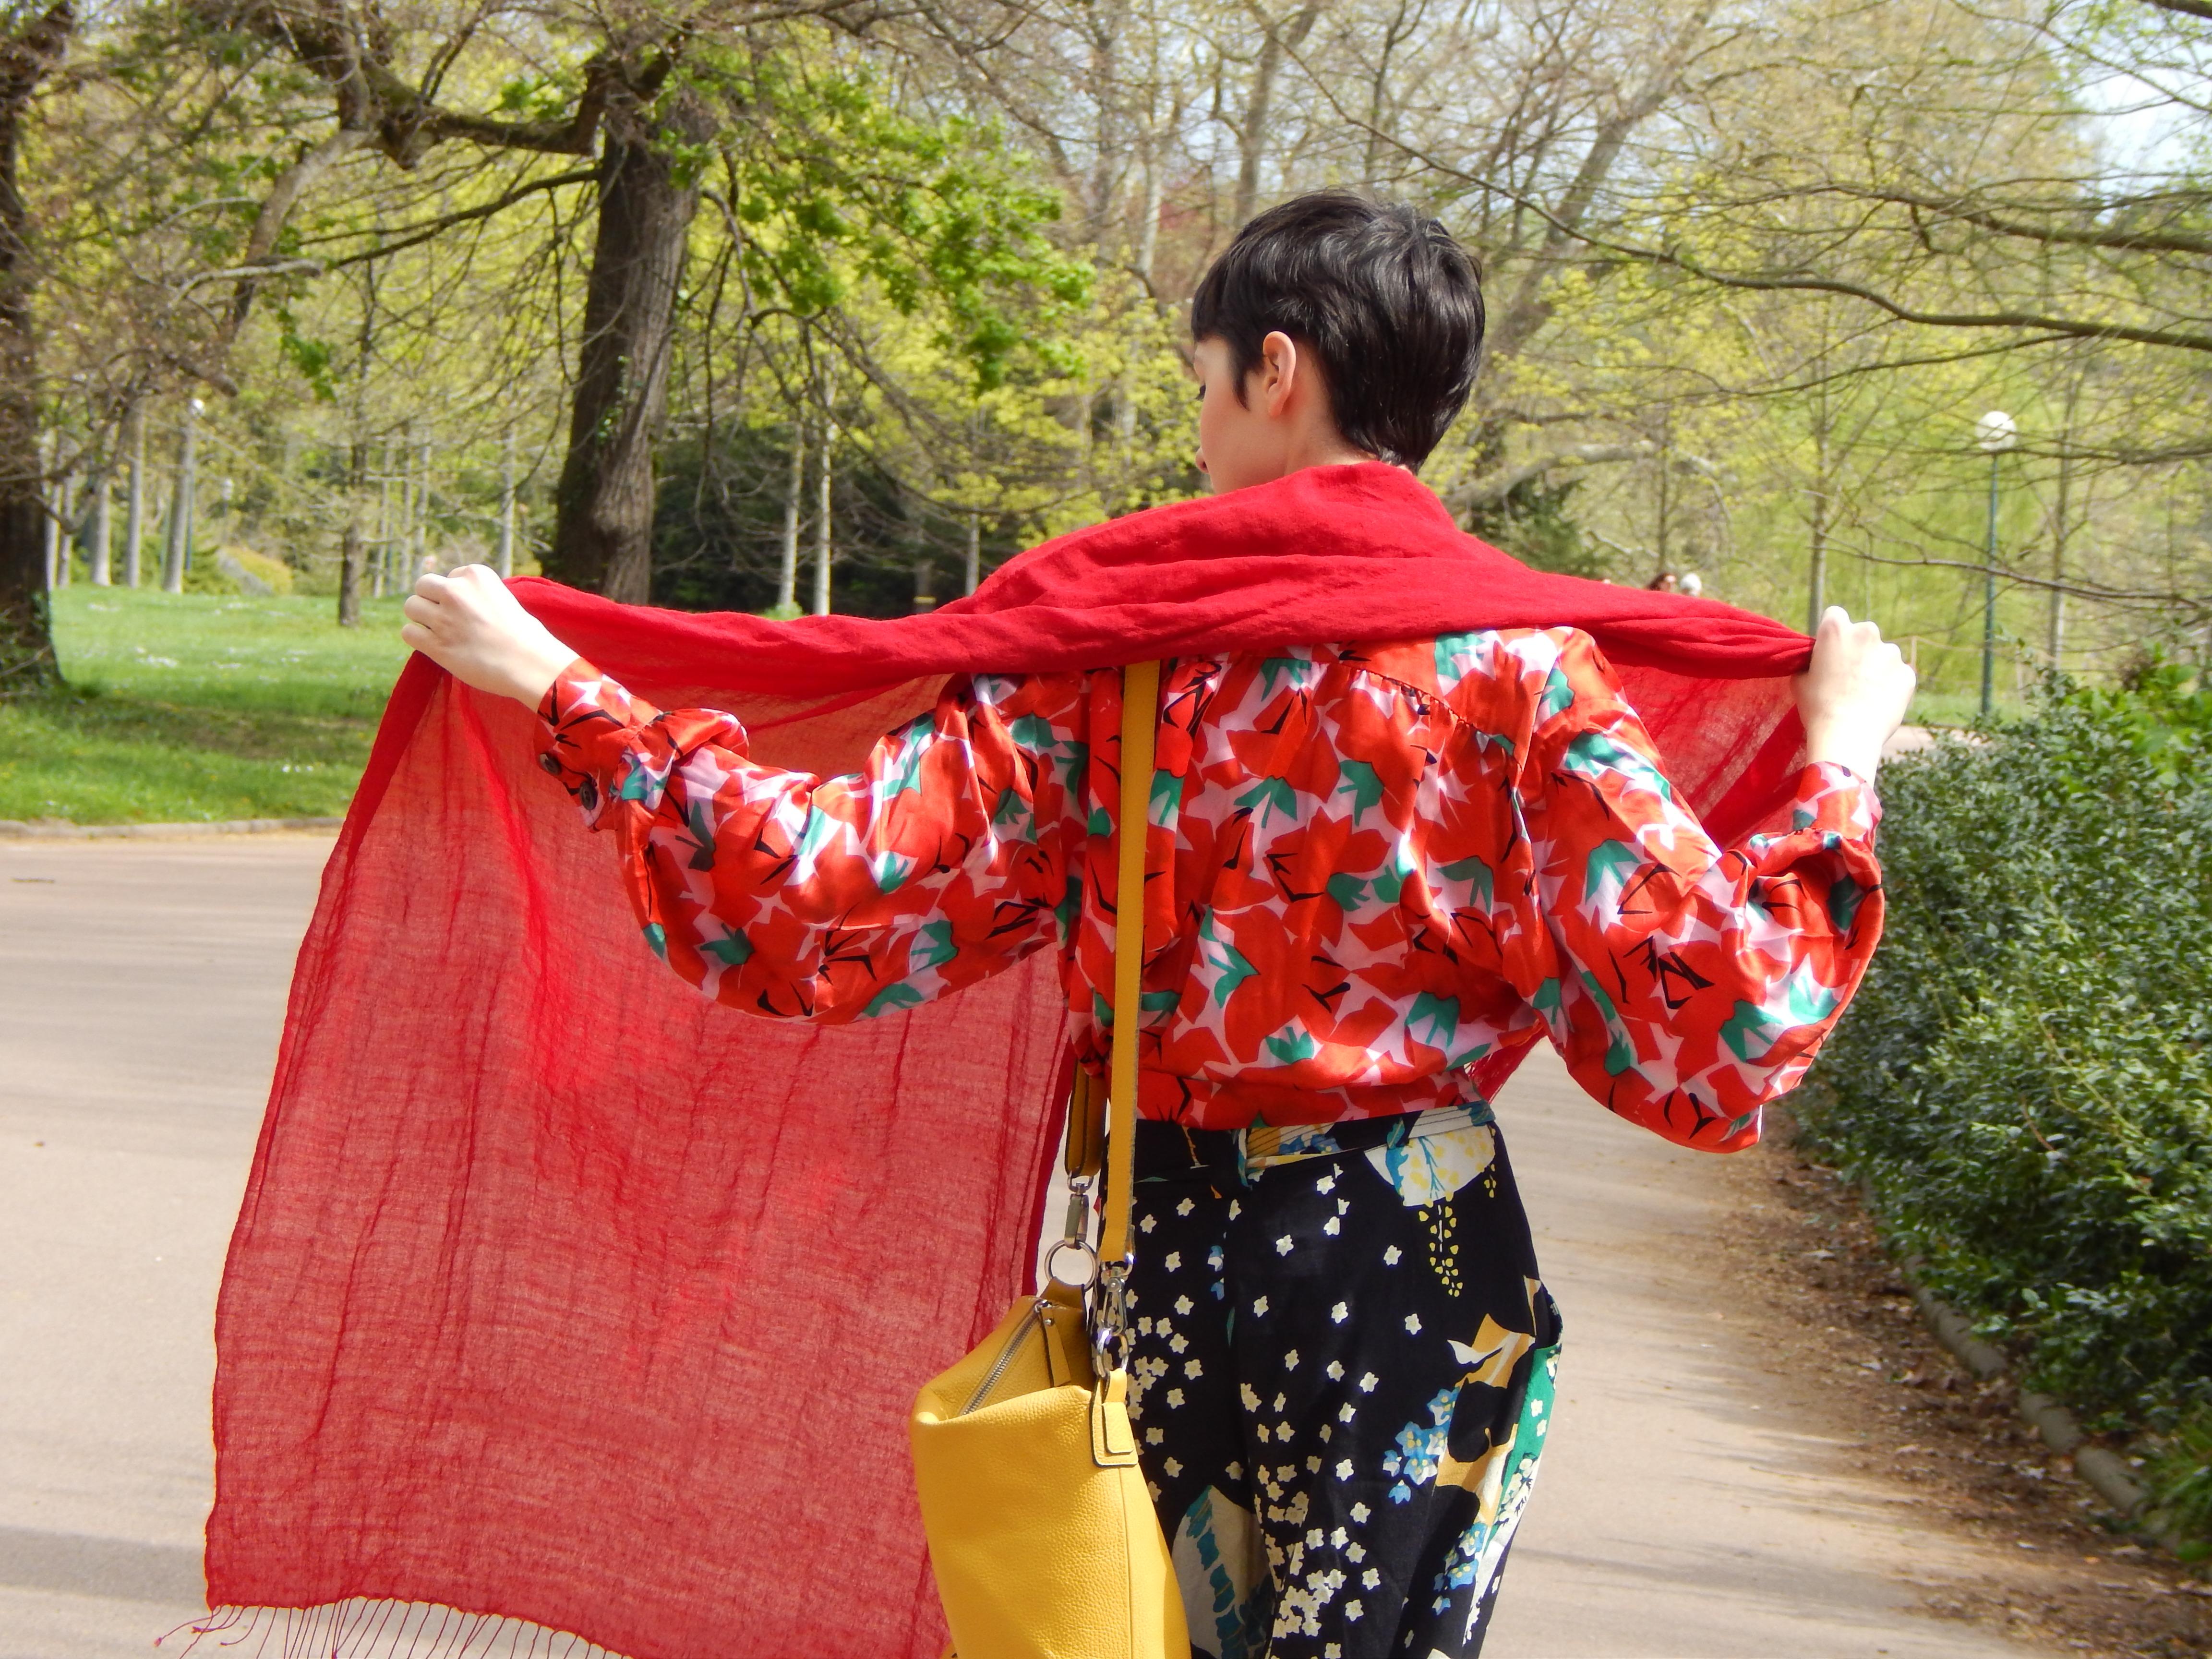 écharpe rouge & sac jaune